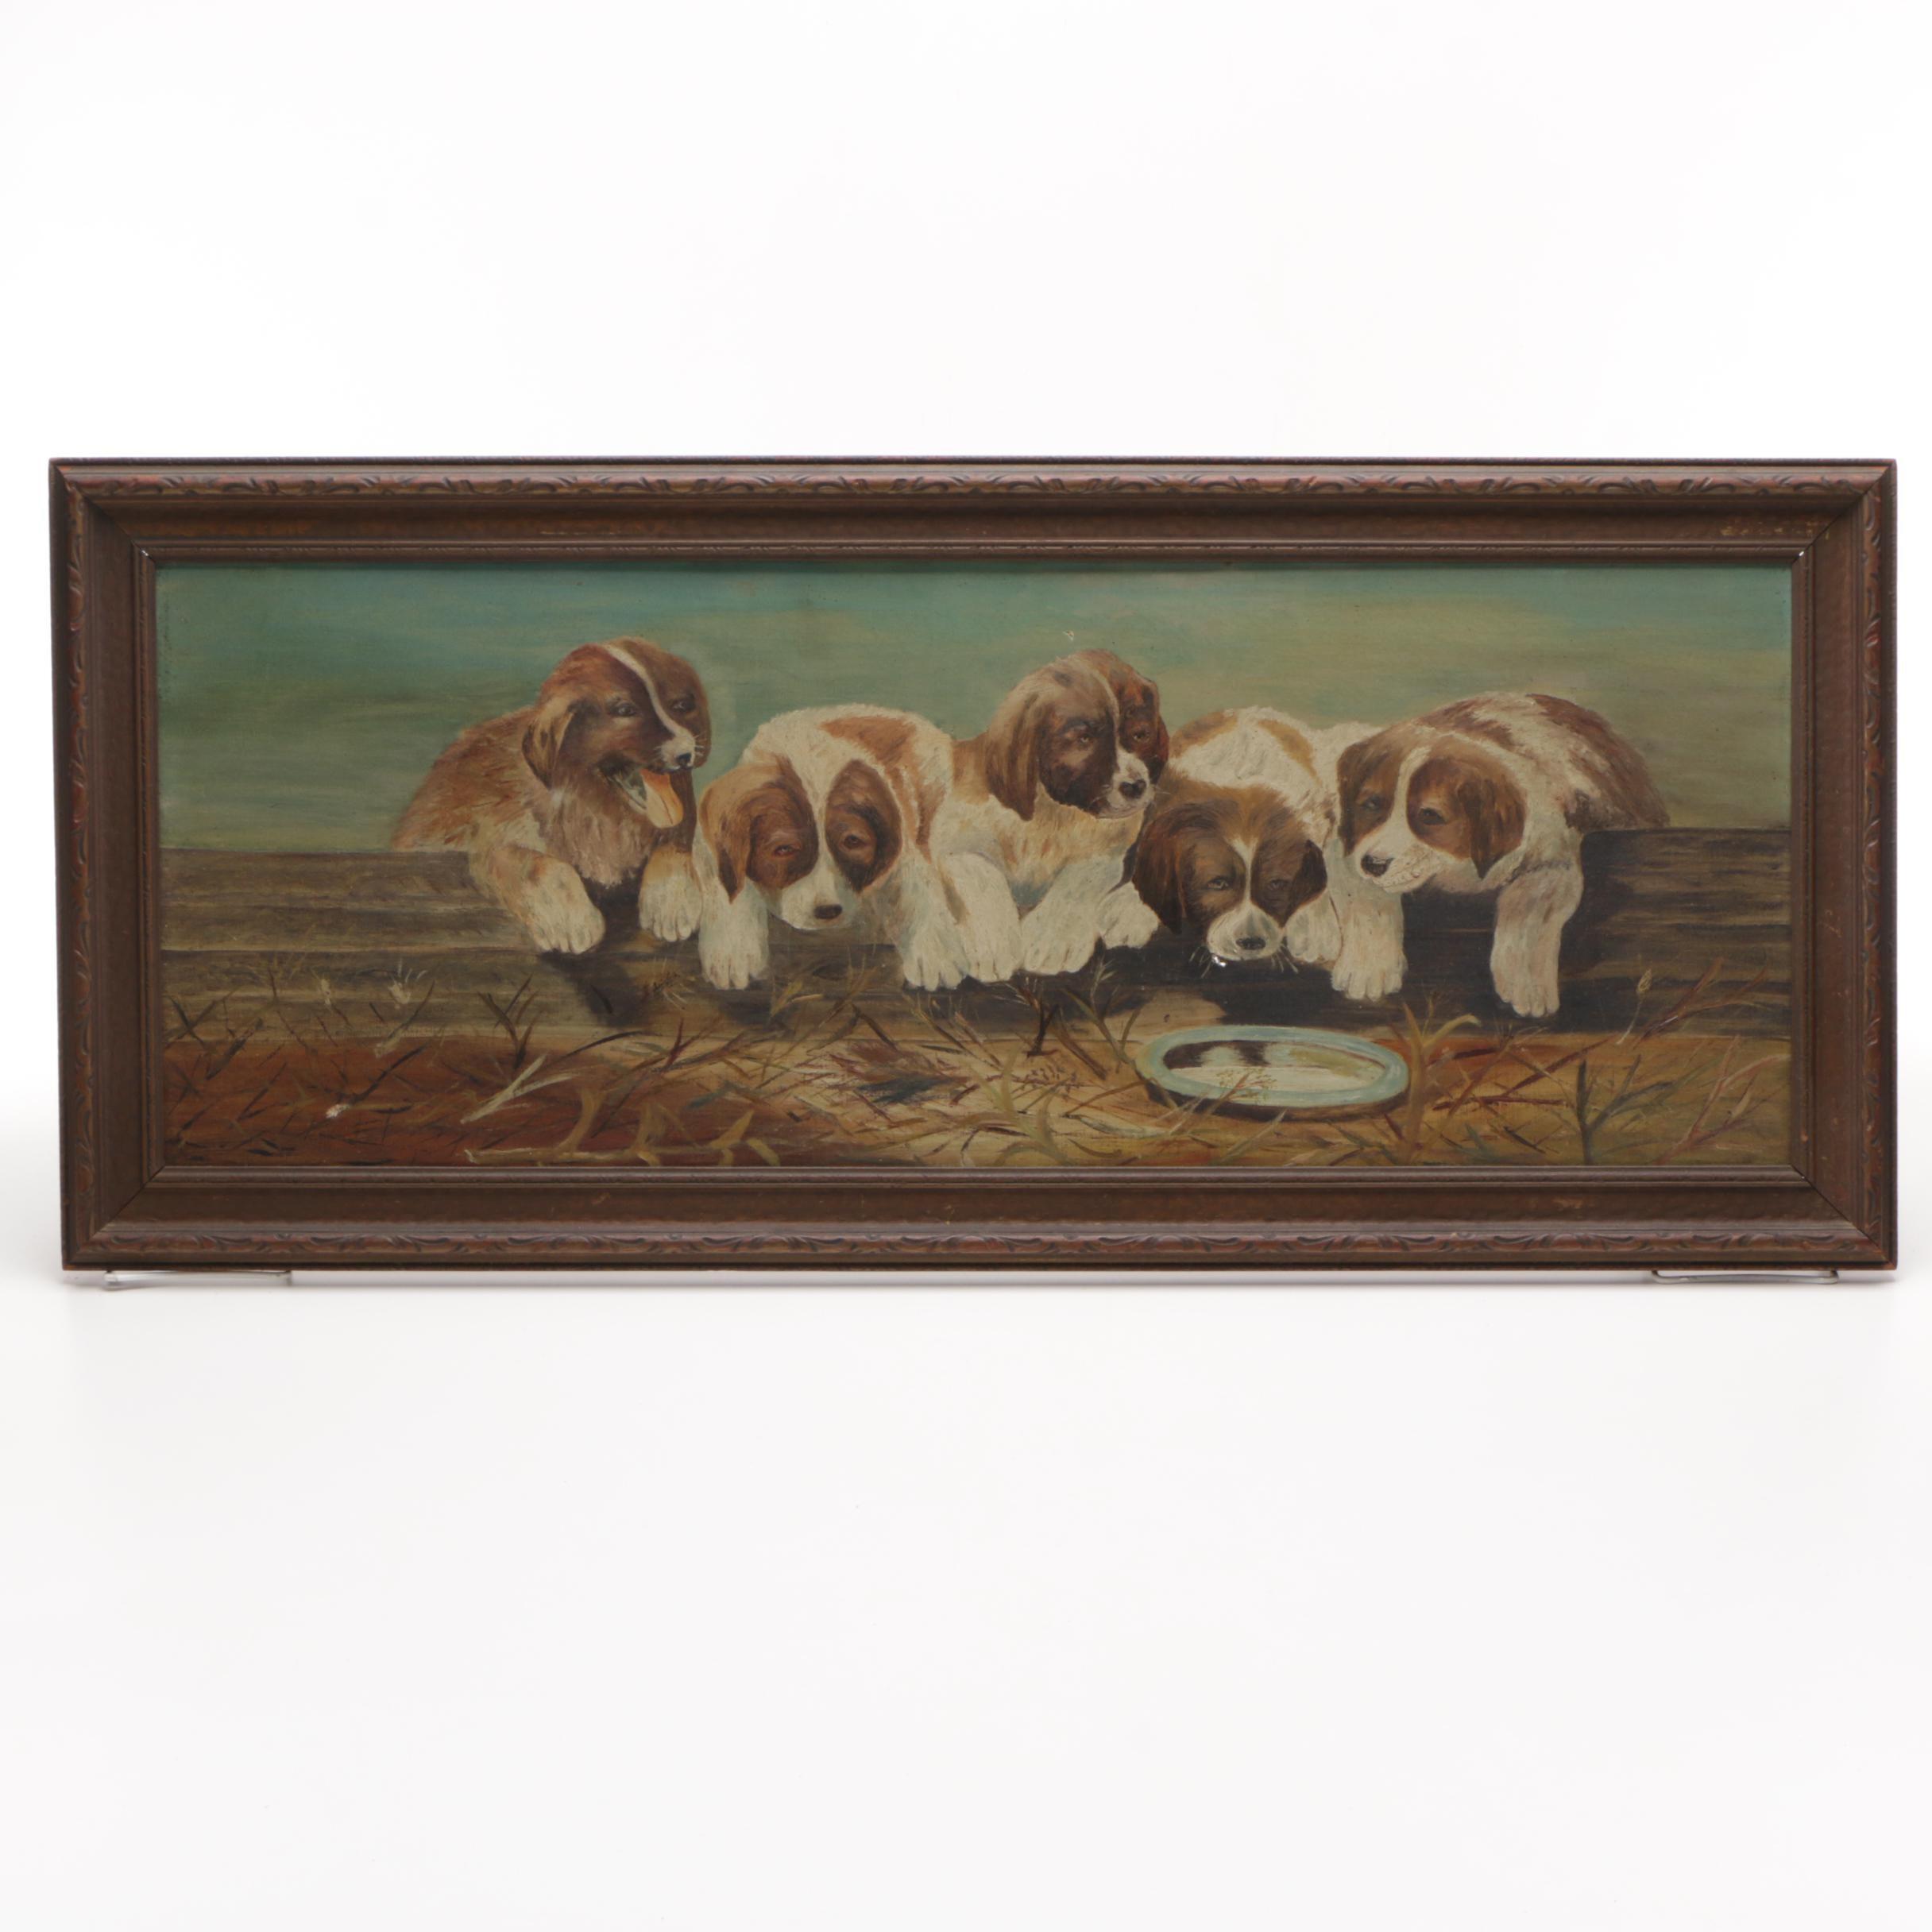 Antique Original Naïve Barnyard Genre Oil Painting on Canvas of Puppies